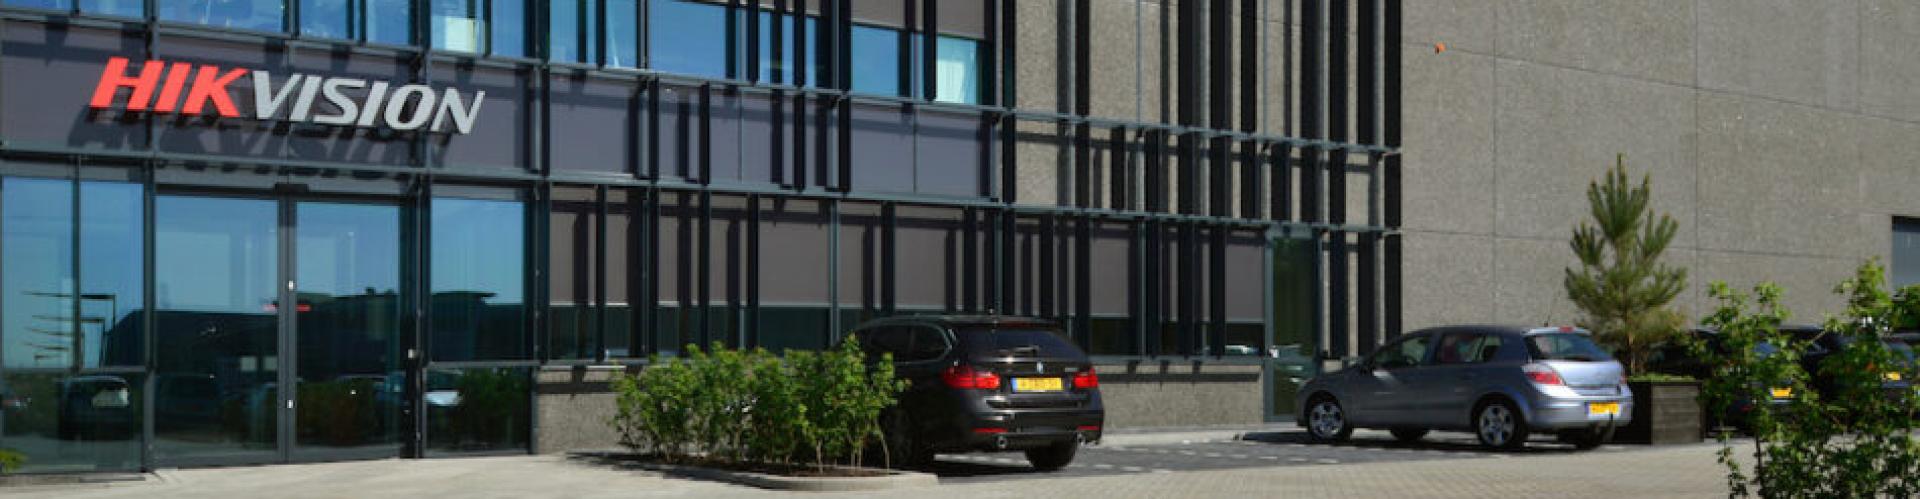 Business Development Manager Logistics vacature Hikvision